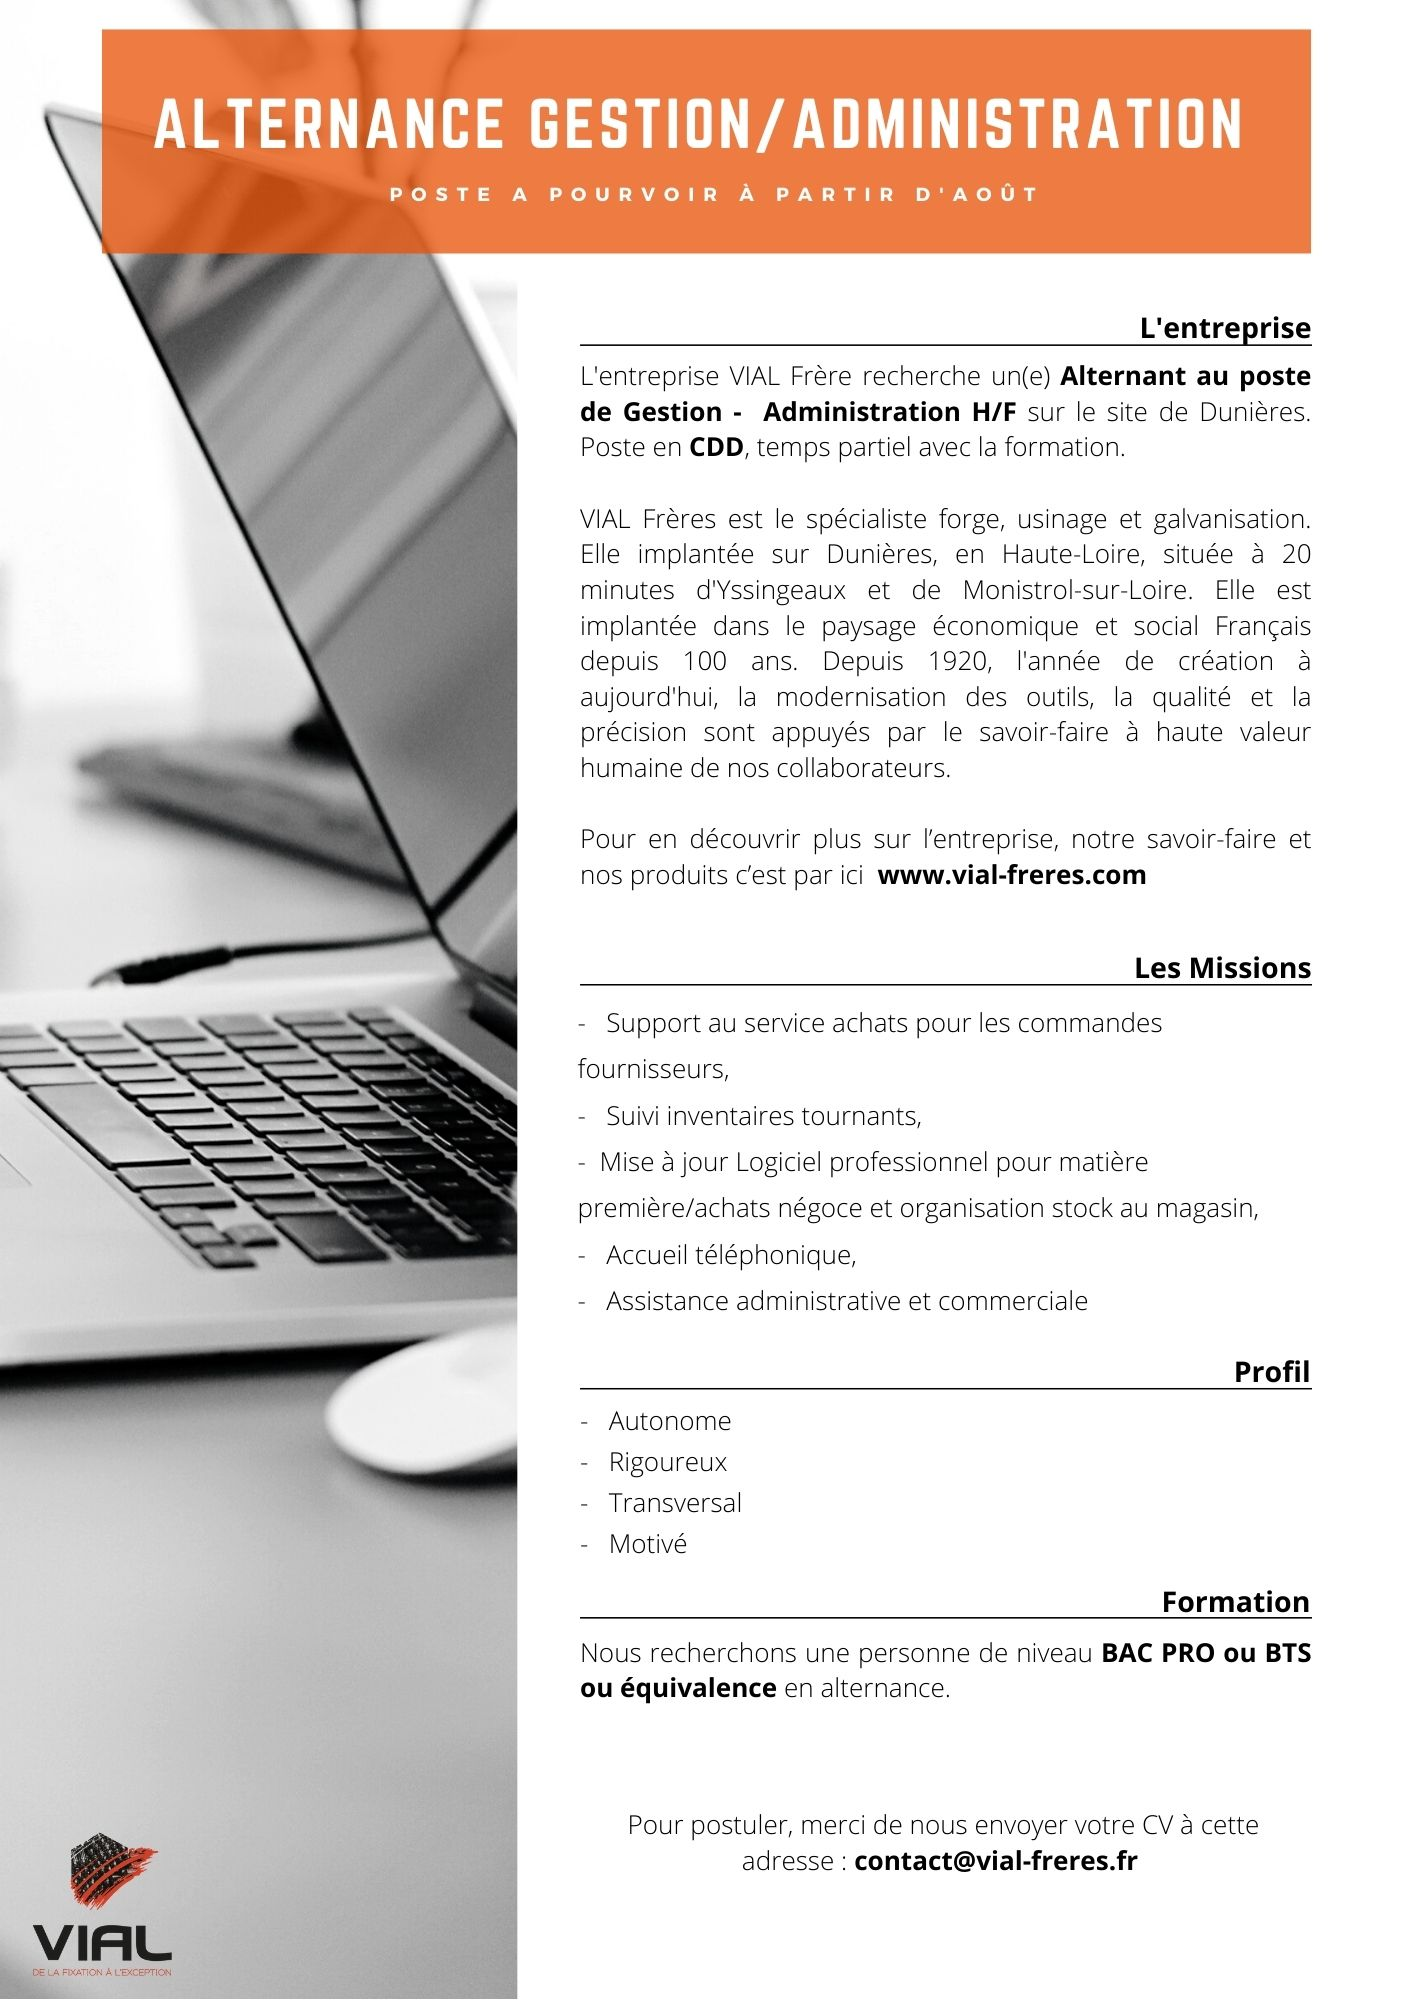 offre-demploi-VIAL-alternance-gestion-administration